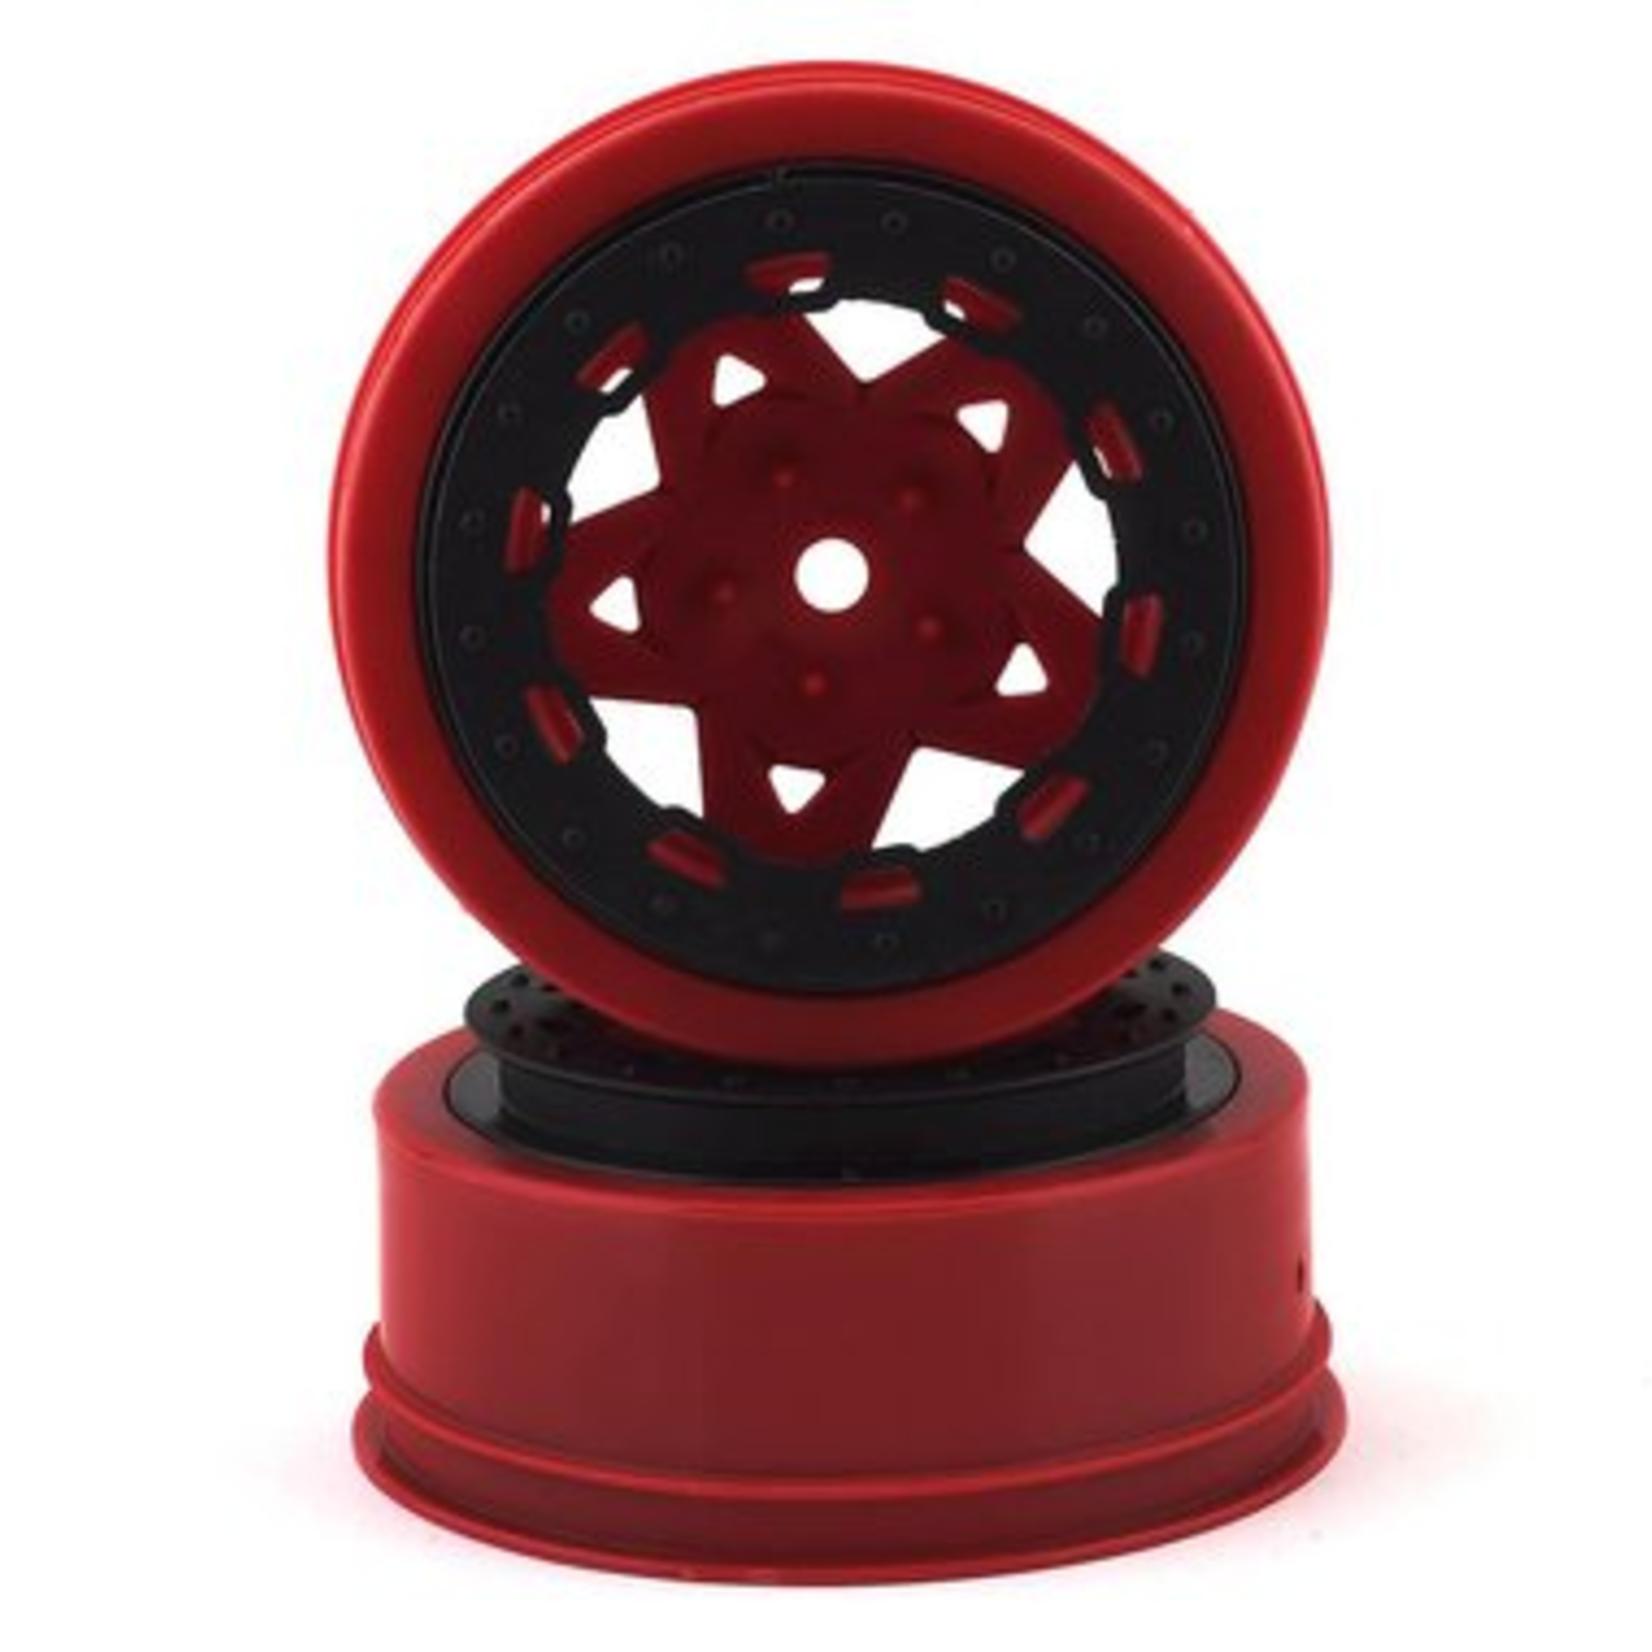 JConcepts JCO3390RB JConcepts Tremor Slash narrow front wheel-RED/BLK BDLCK (2)